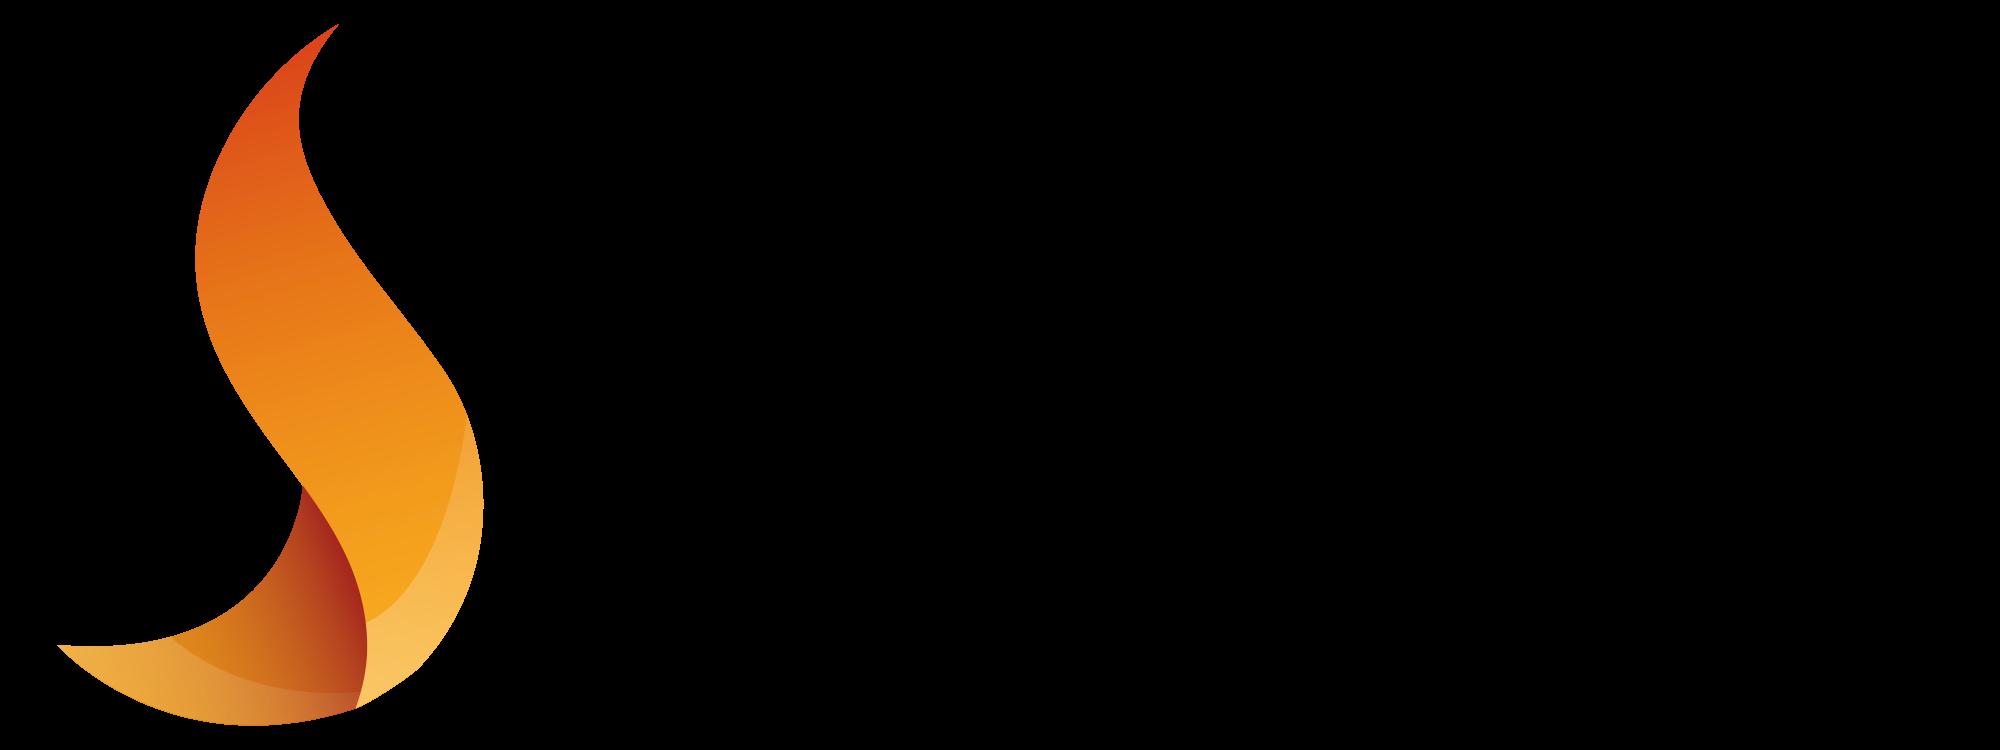 IGNITE Horizontal - Black-1